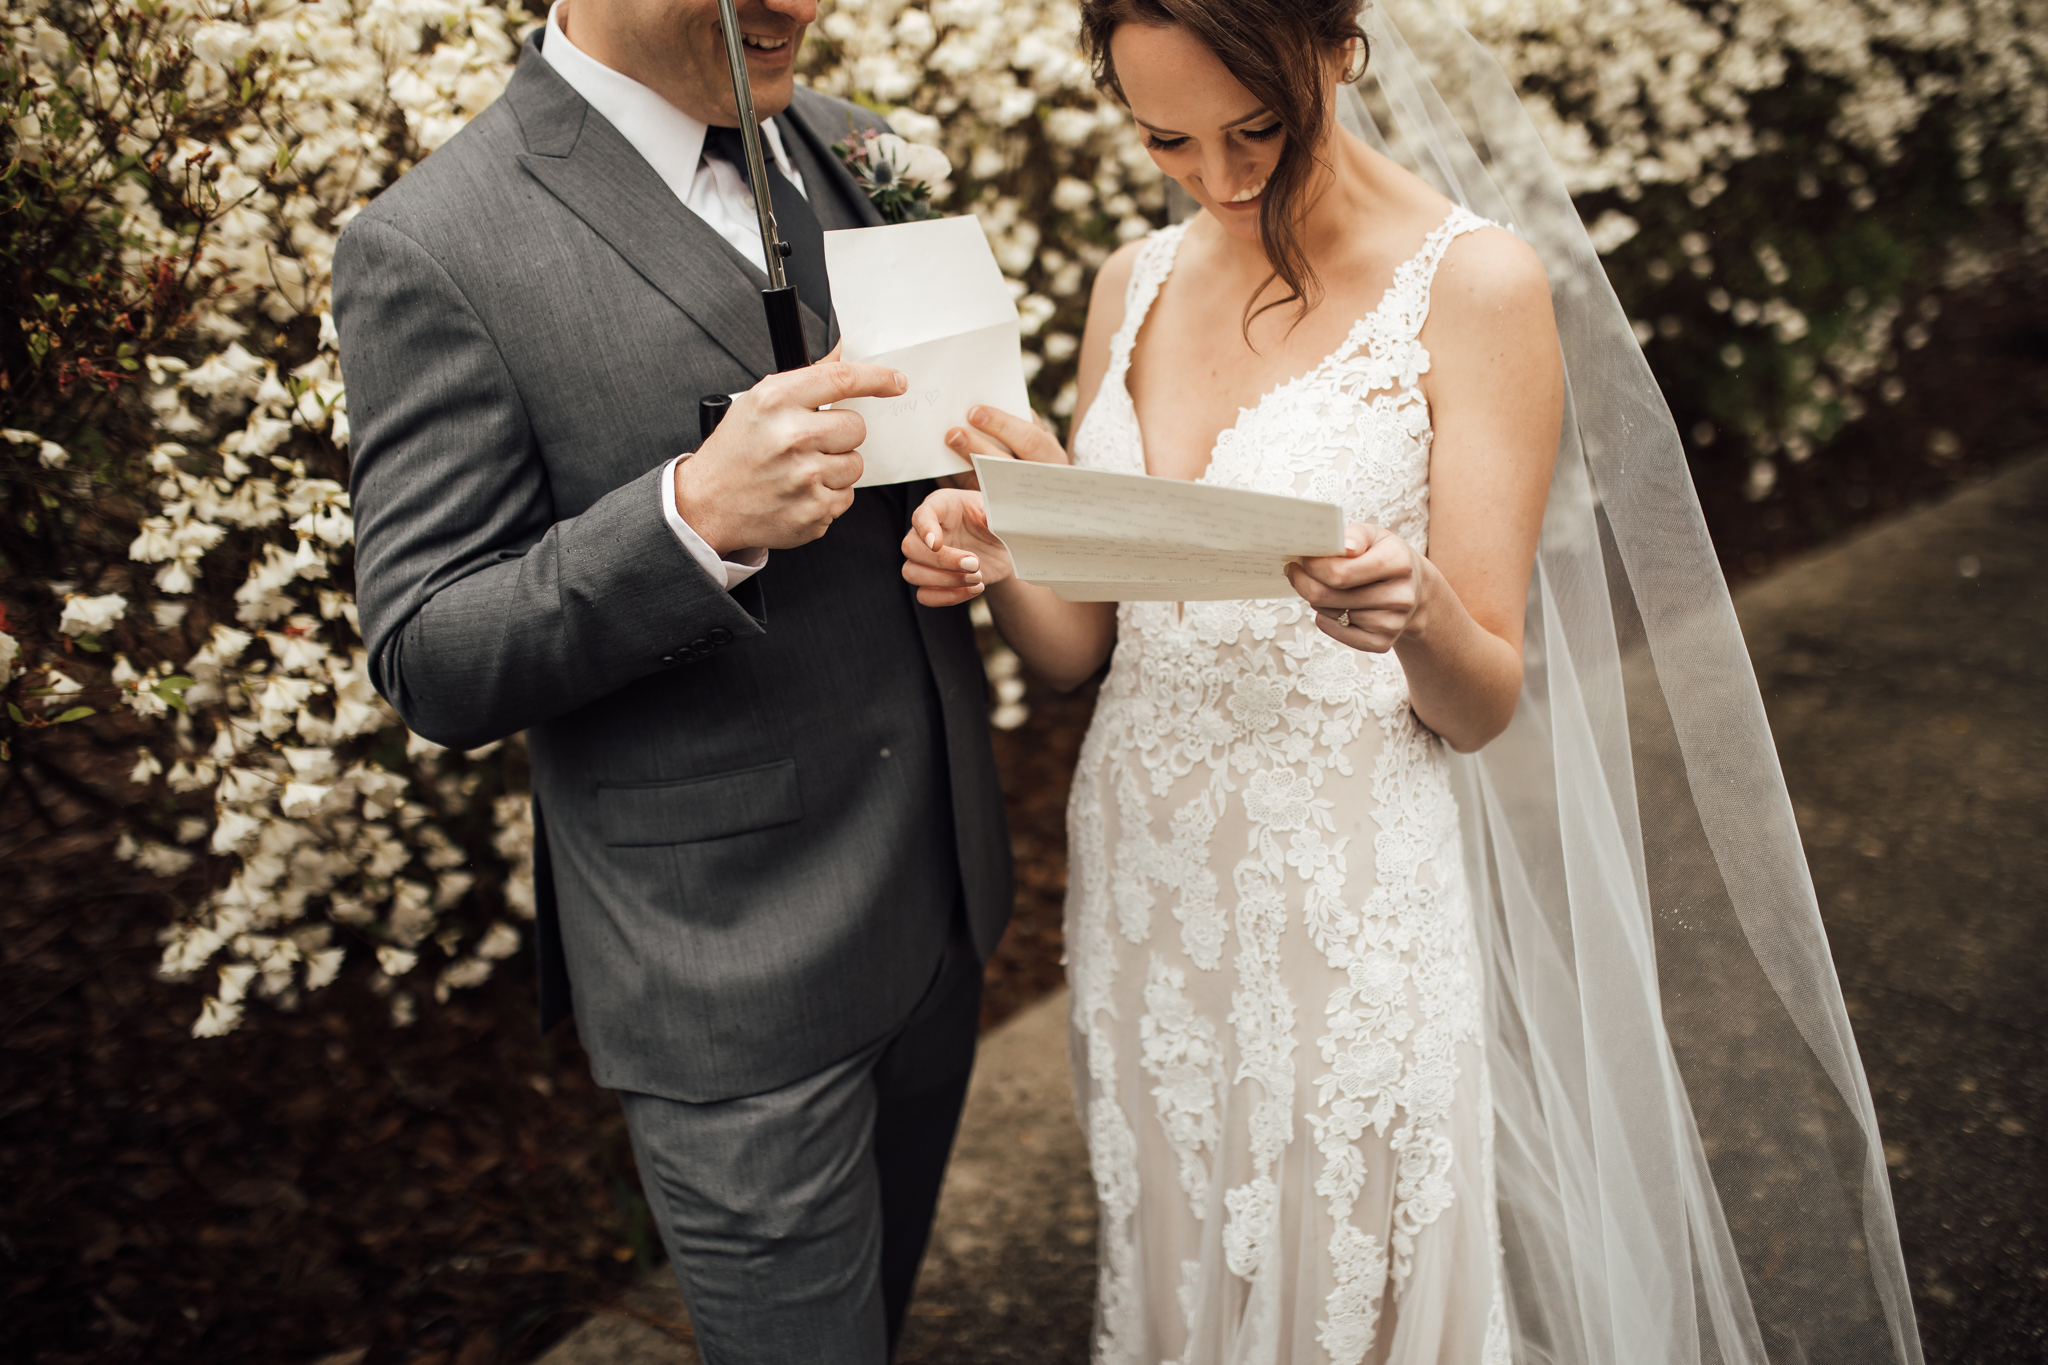 birmingham-alabama-wedding-photographer-laura-terry-the-warmth-around-you (51 of 110).jpg